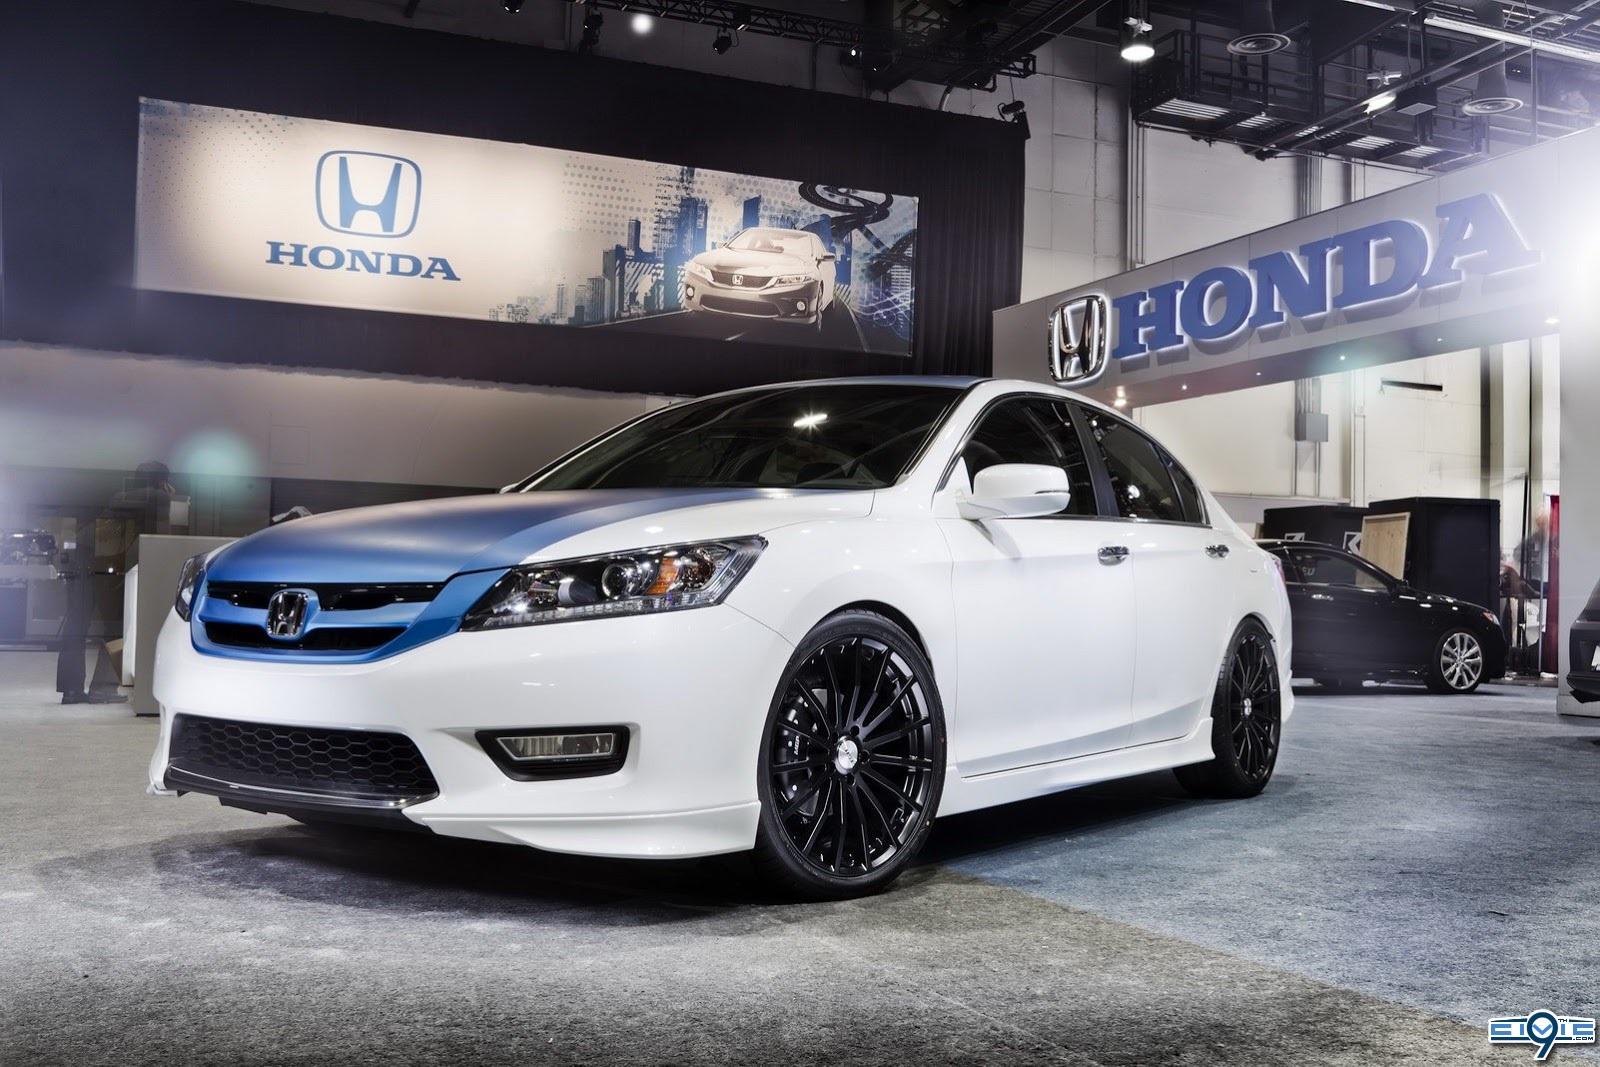 2013 Honda Accord Coupe & Sedan At Sema | 9th Generation Honda Civic ...